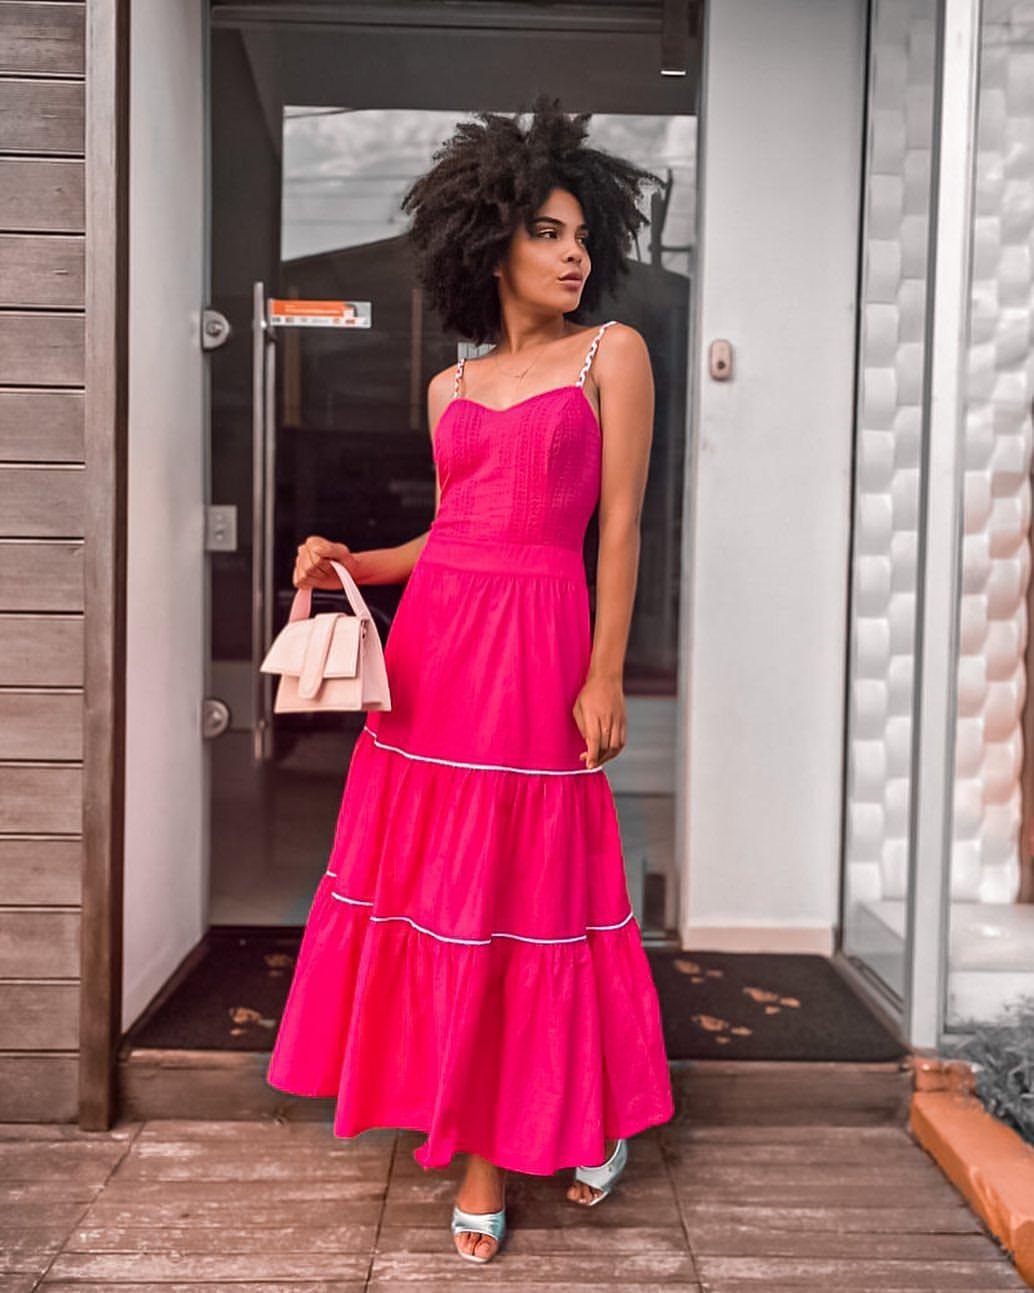 debora layla, miss amapa mundo 2019. 67424322